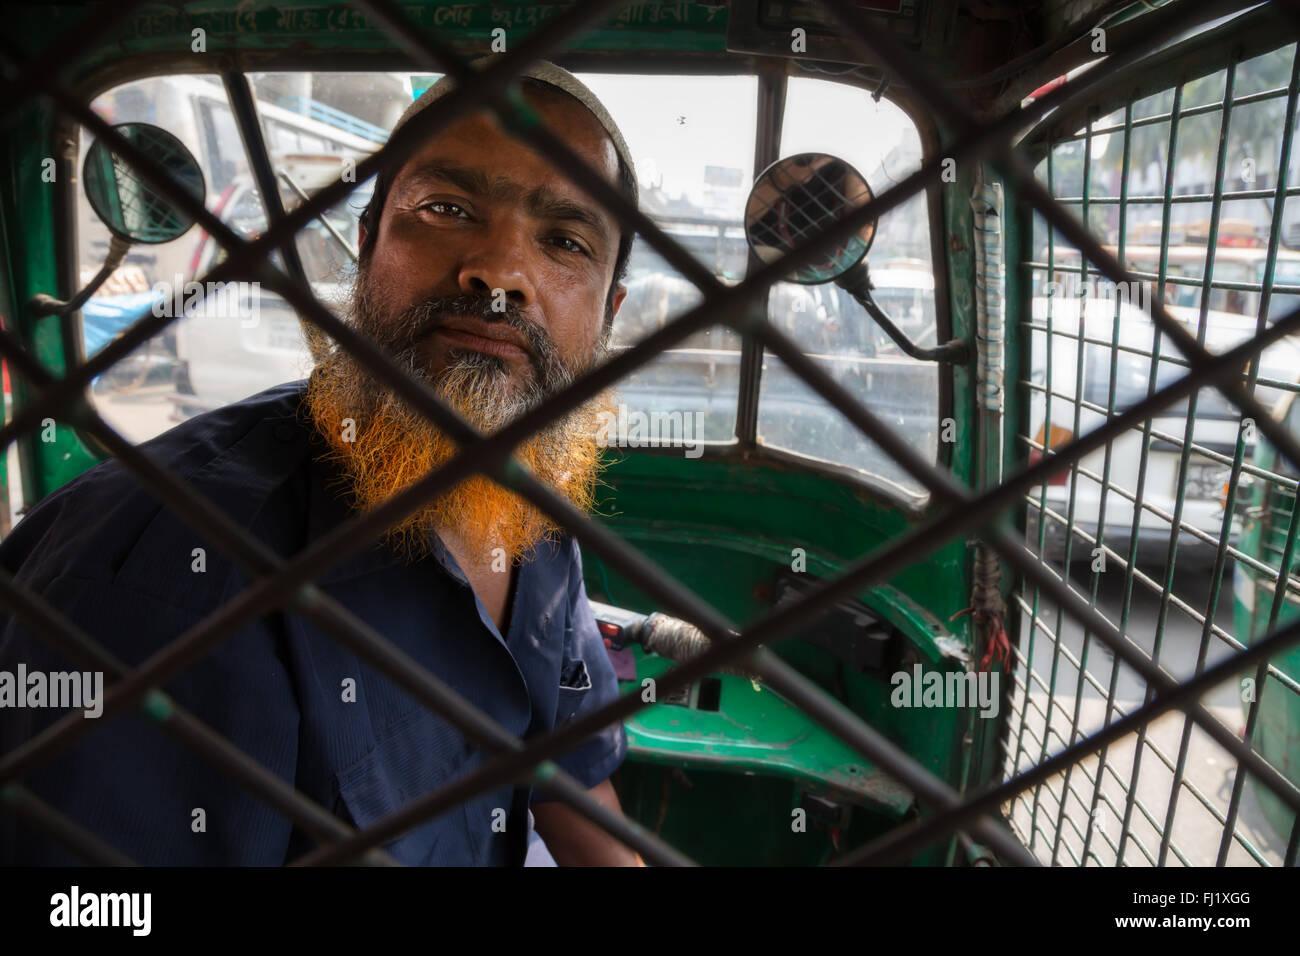 Taxi driver rickshaw en Dhaka, Bangladesh Imagen De Stock